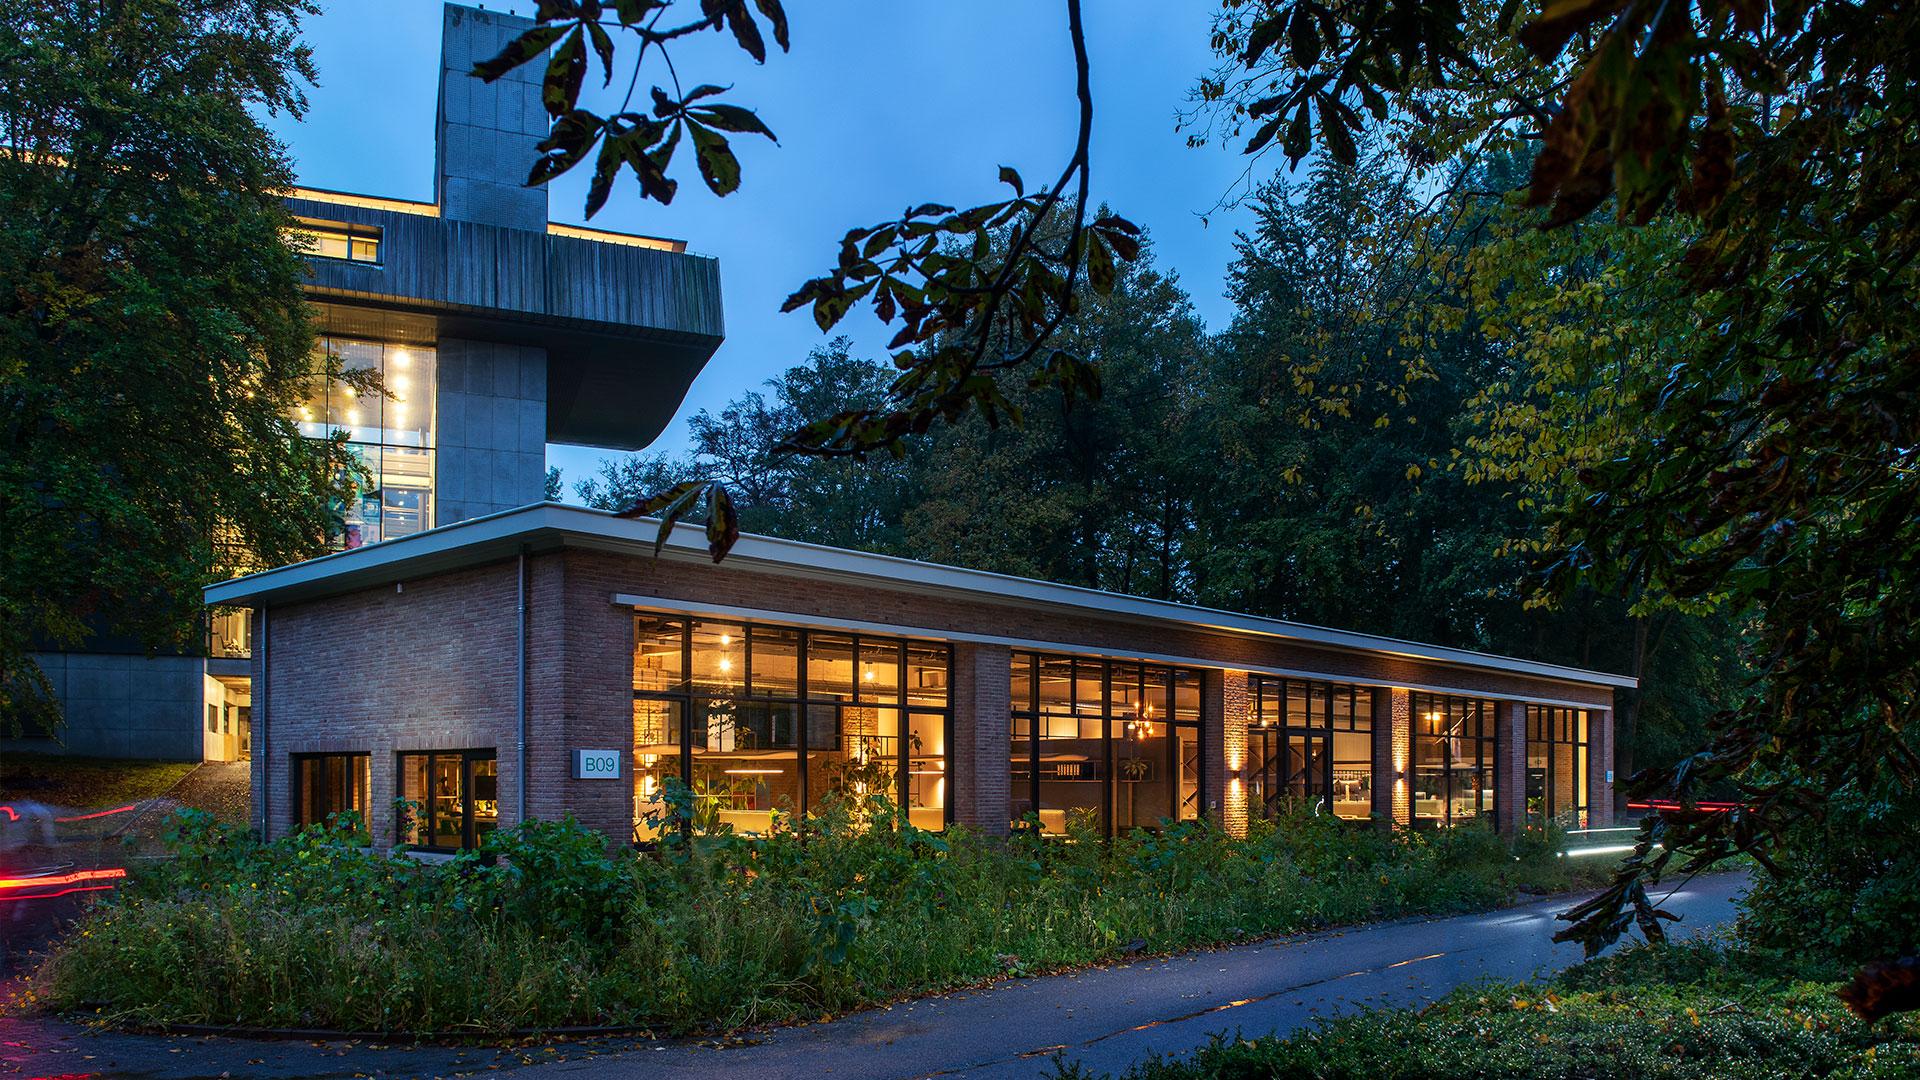 Arnhems-Buiten_B09_Weusten-Liedenbaum-Architecten_kantoor-avond